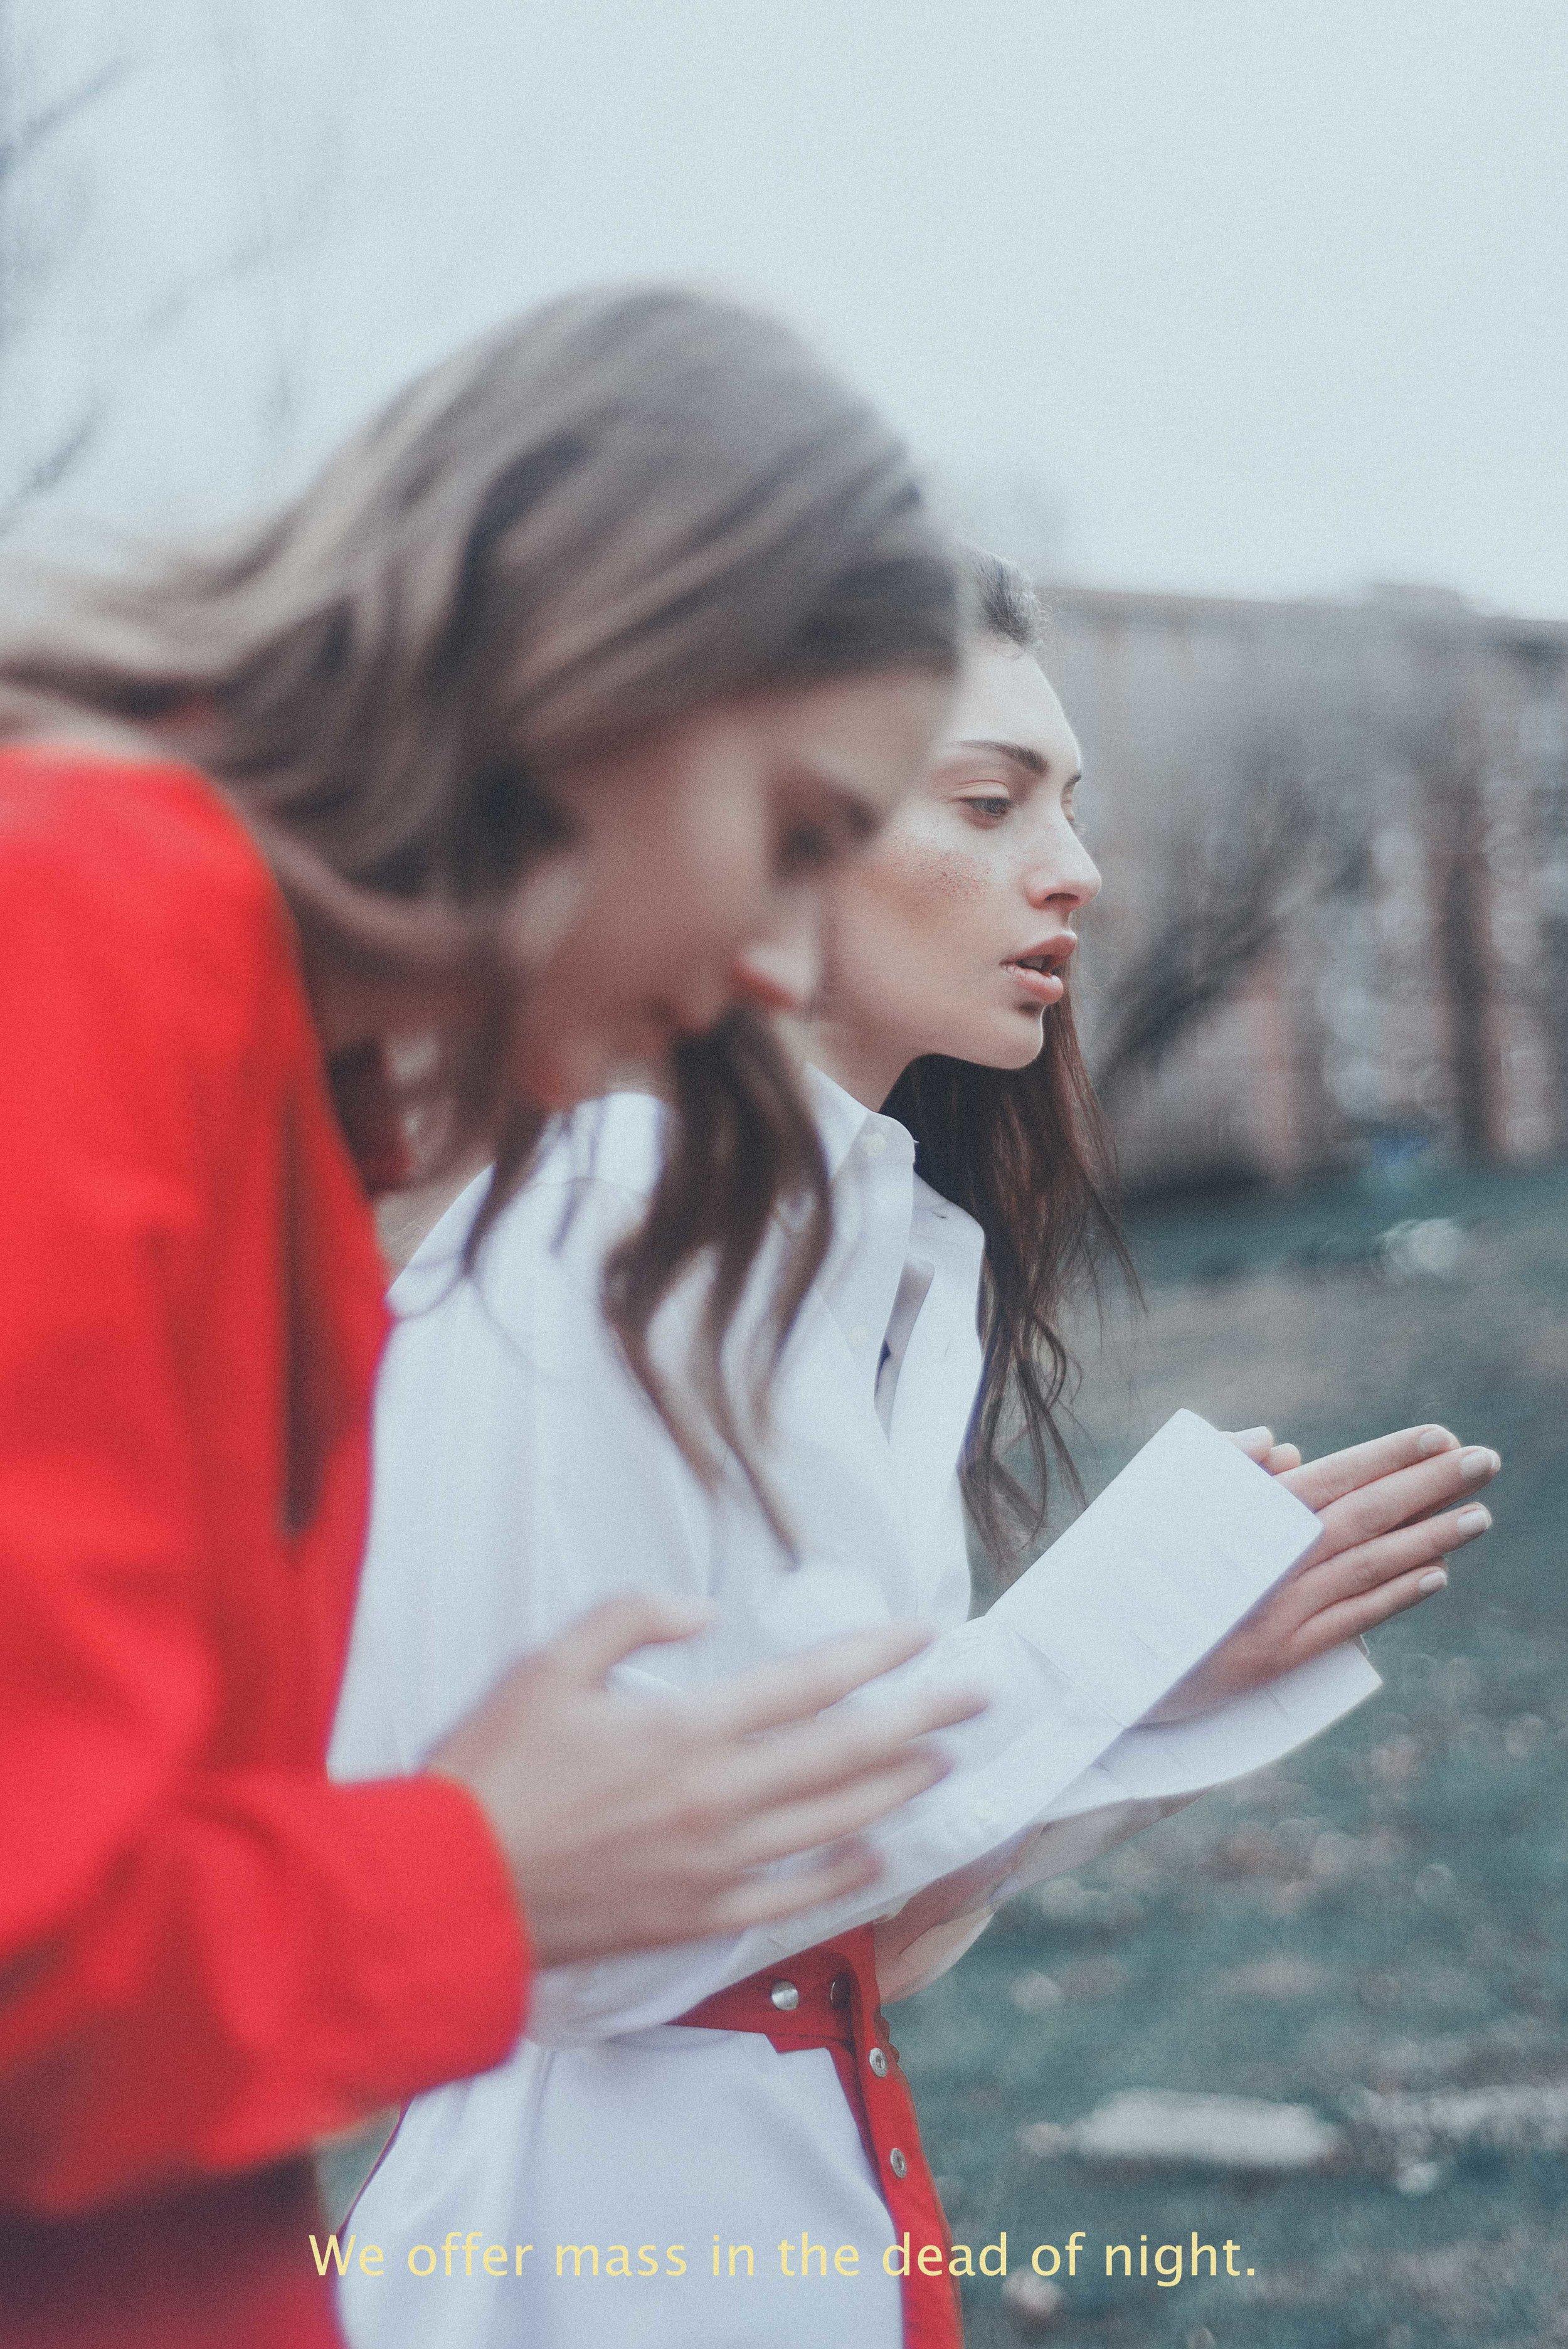 ONEMAG - DEAR FATHER VALIGNANO  PHOTOGRAPHY Jessica Zambellini / Art Direction & Style by Aparna Liz Mohan / Hair & Make Up by Ekaterina Kaya.